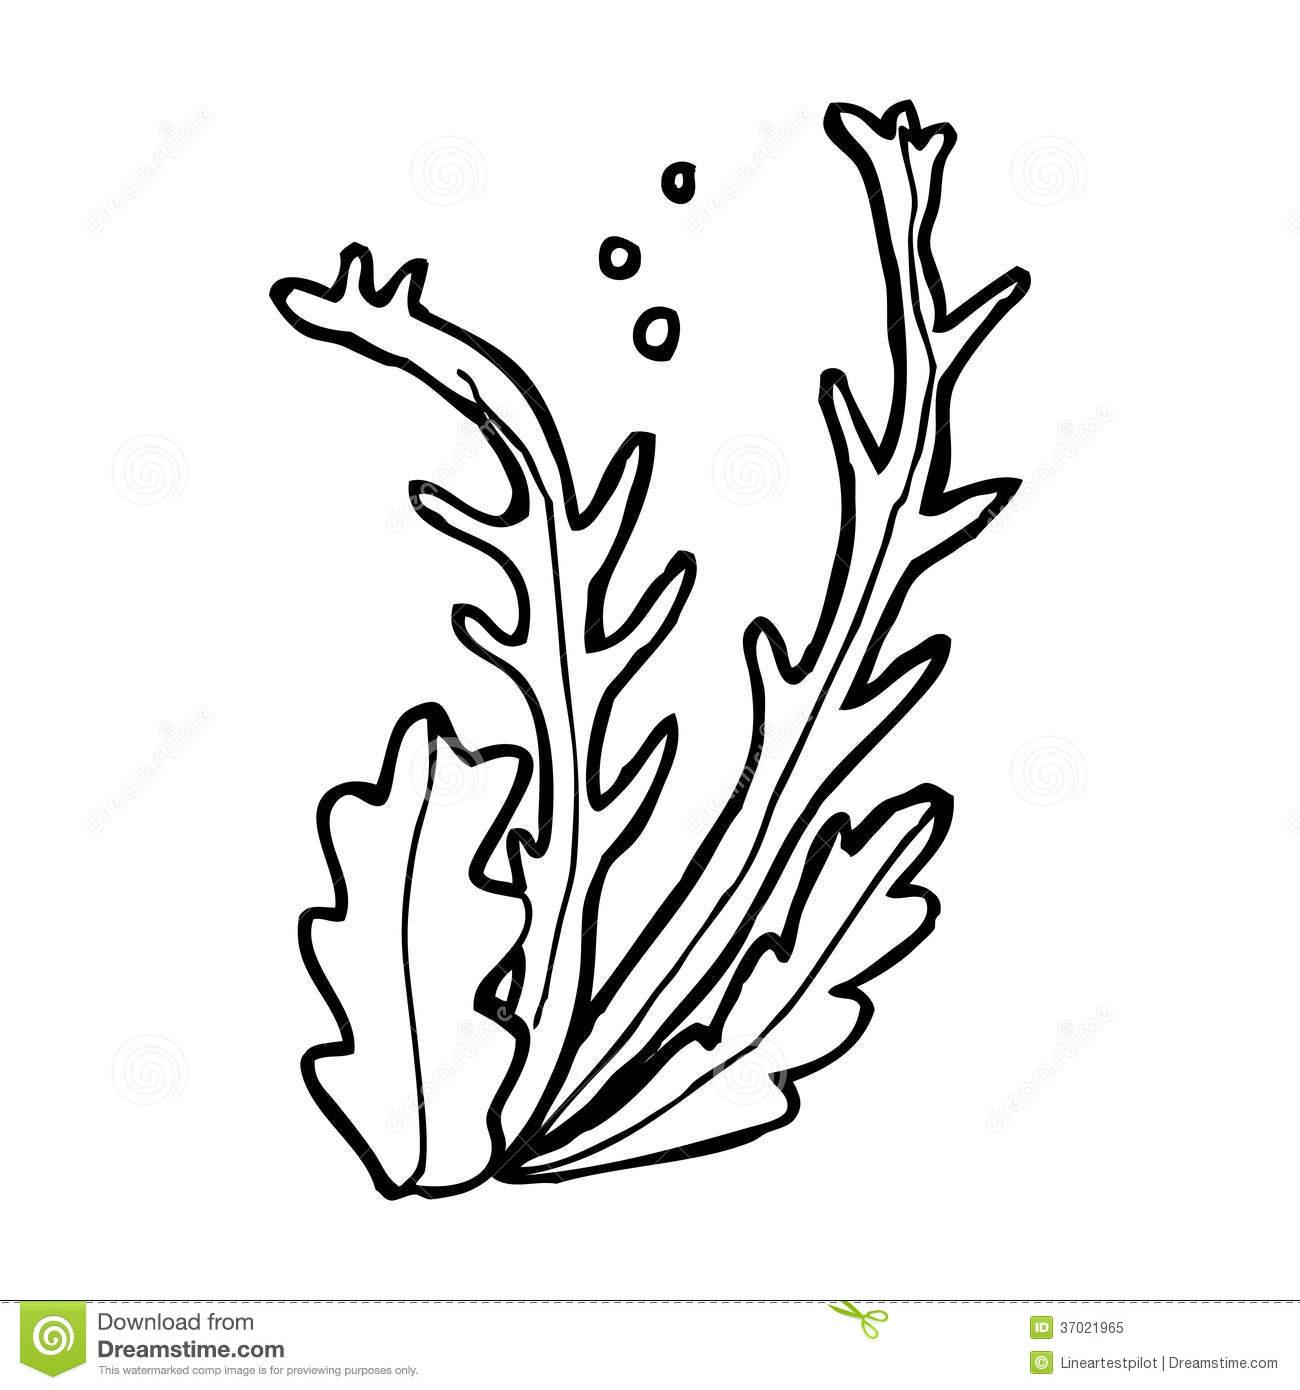 Algae clipart black and white